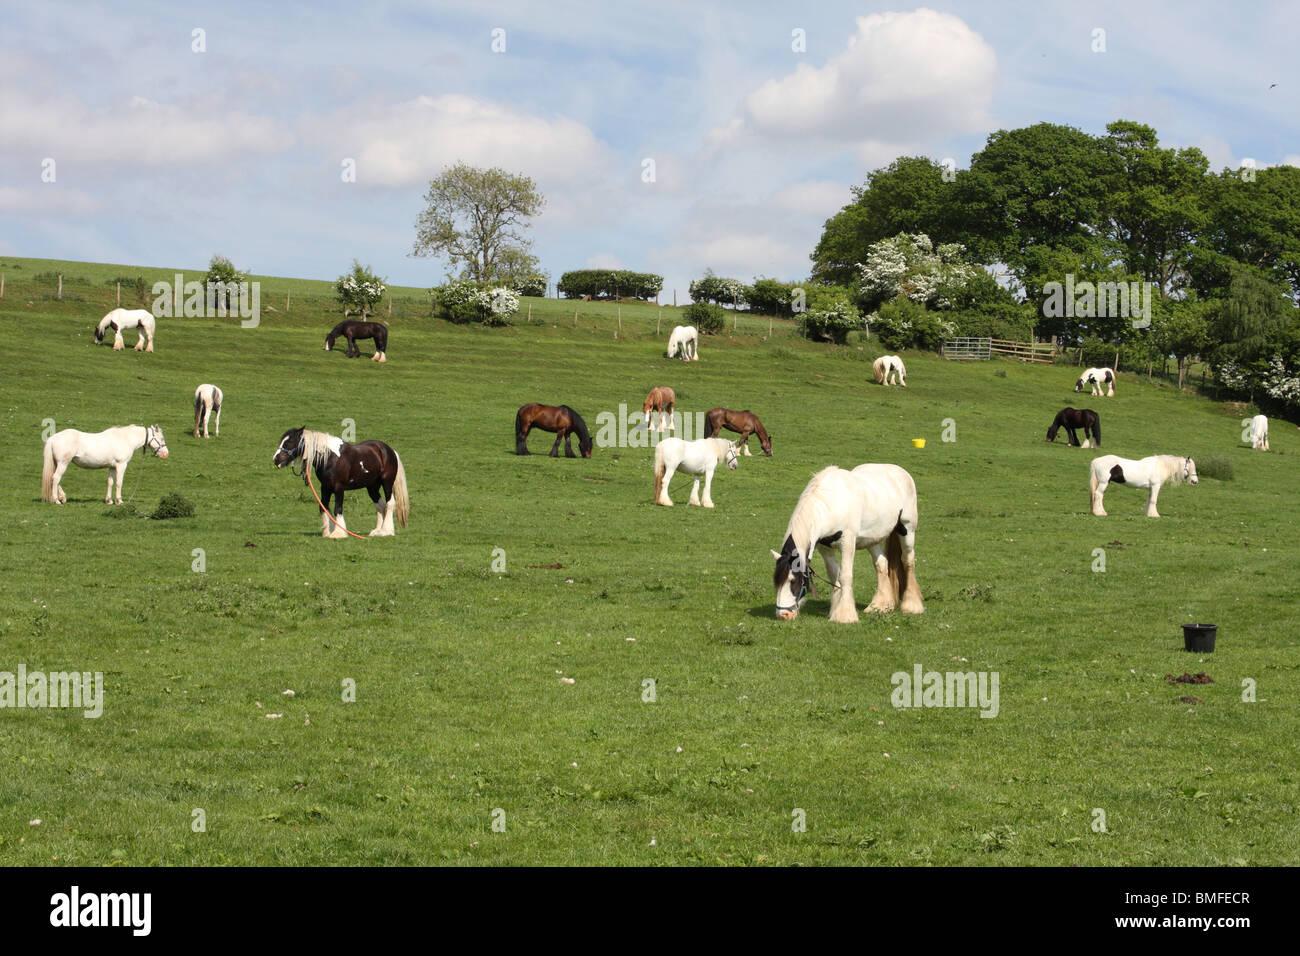 Appleby Horse Fair, Appleby-In-Westmorland, Cumbria, England, U.K. Stock Photo